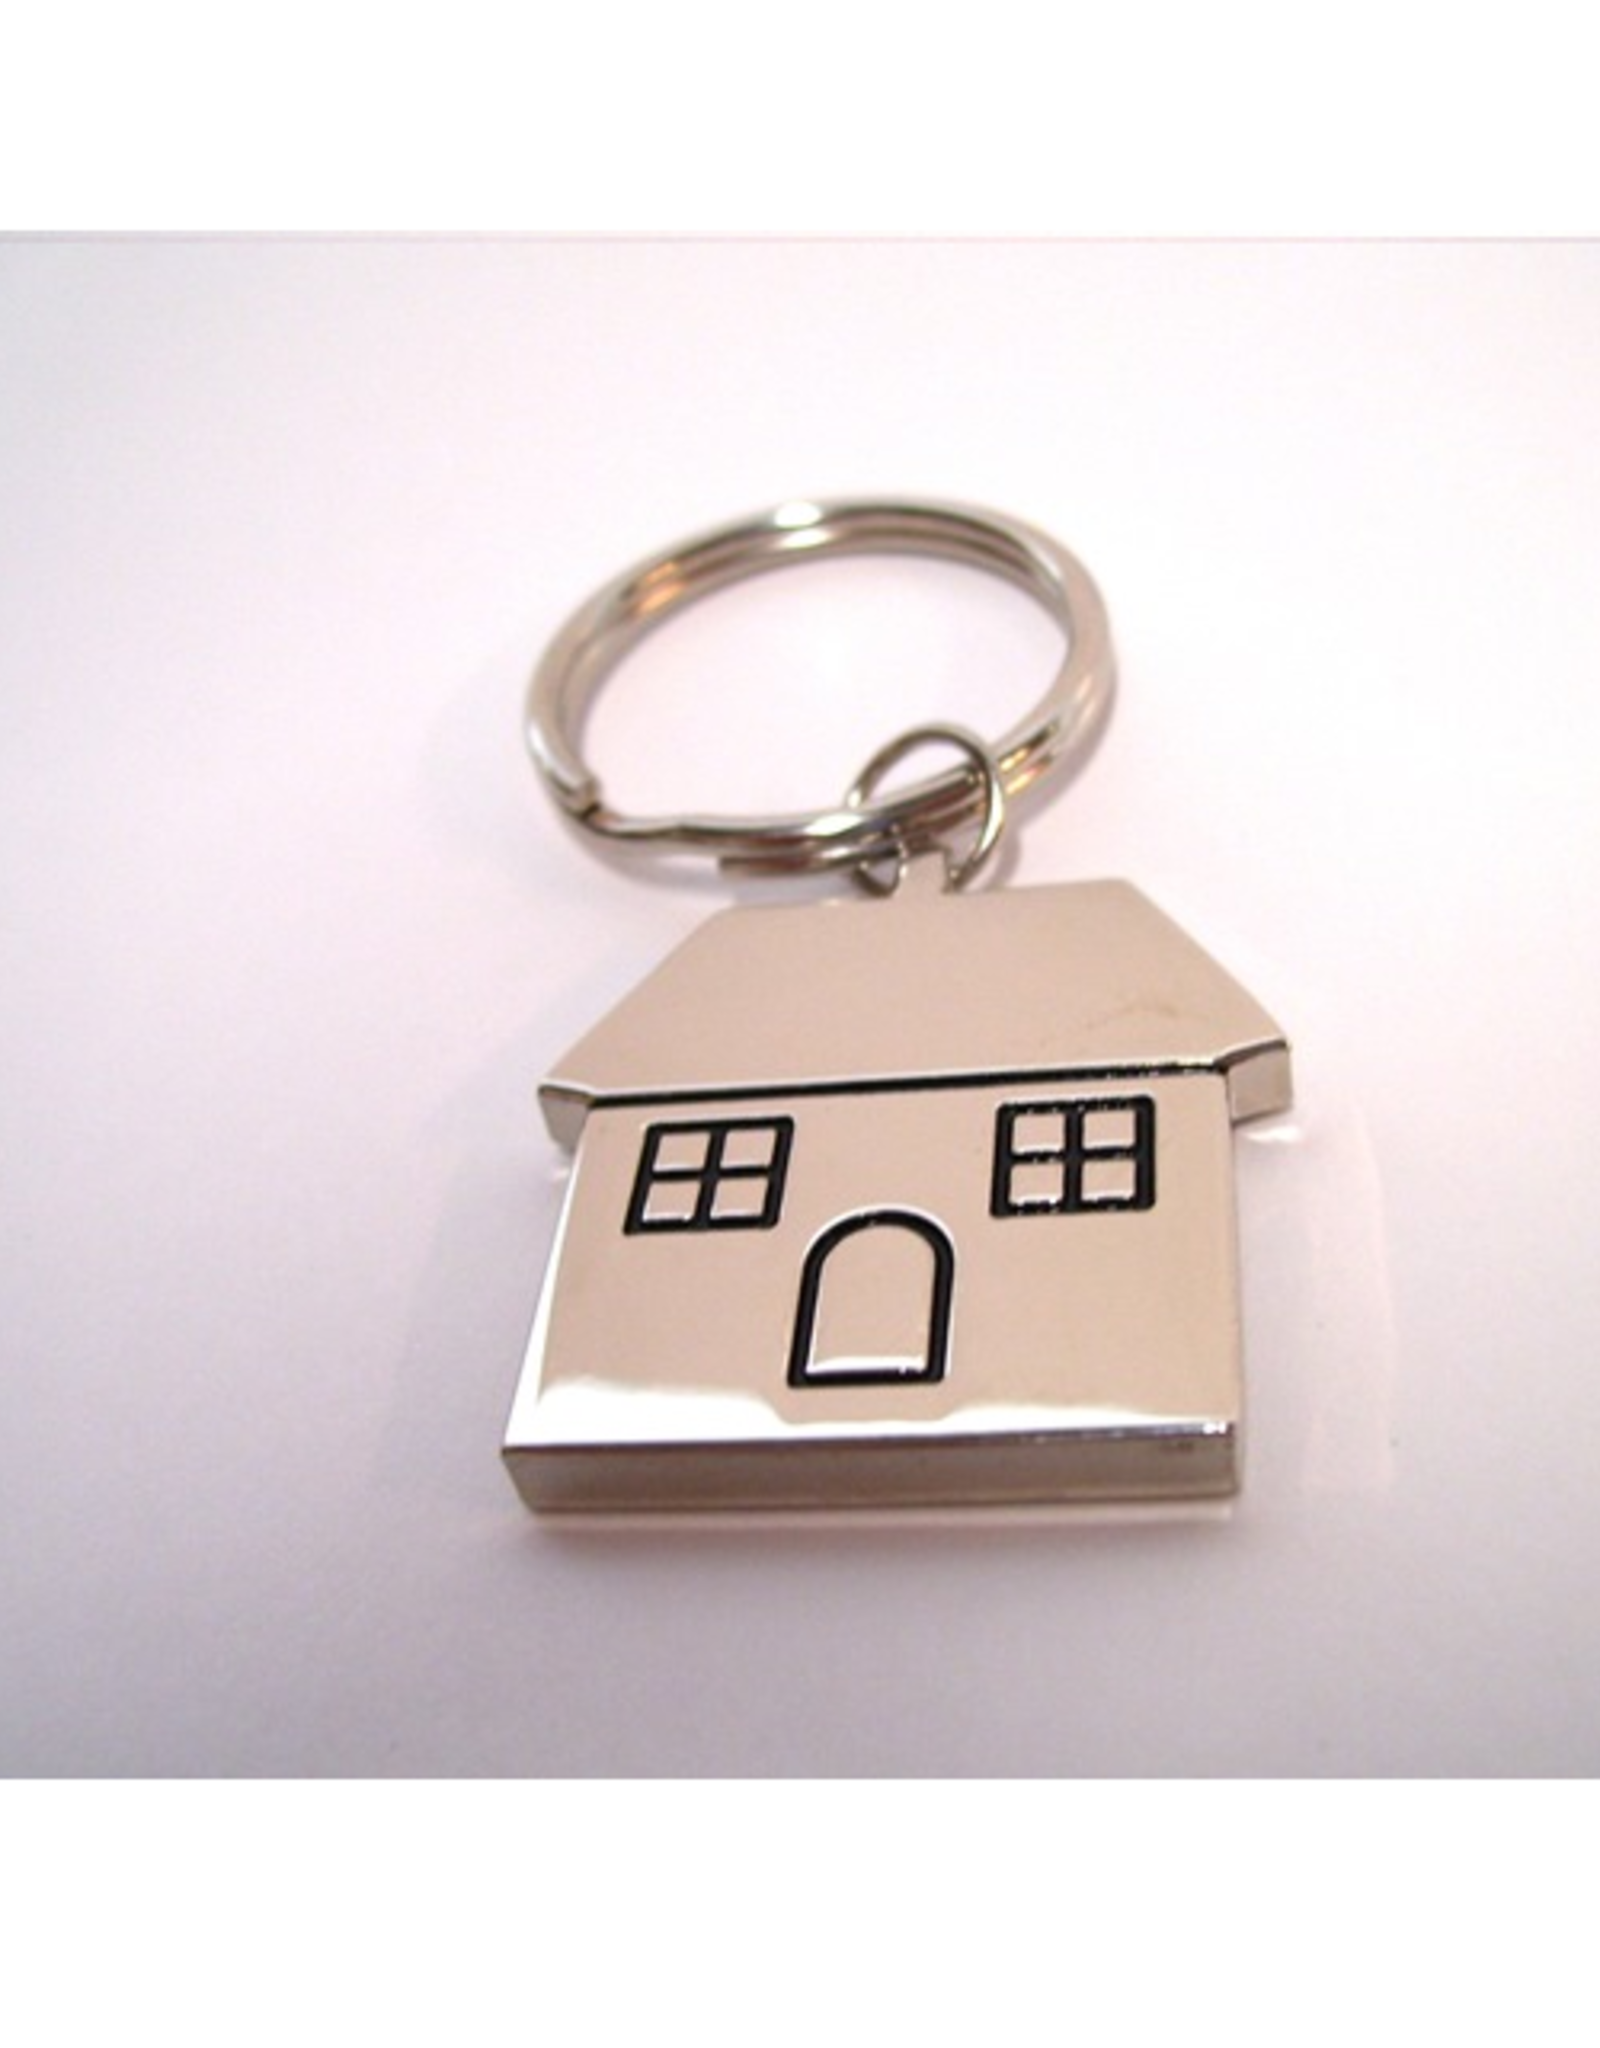 Sleutelhanger Huis RVS - Don Estilo